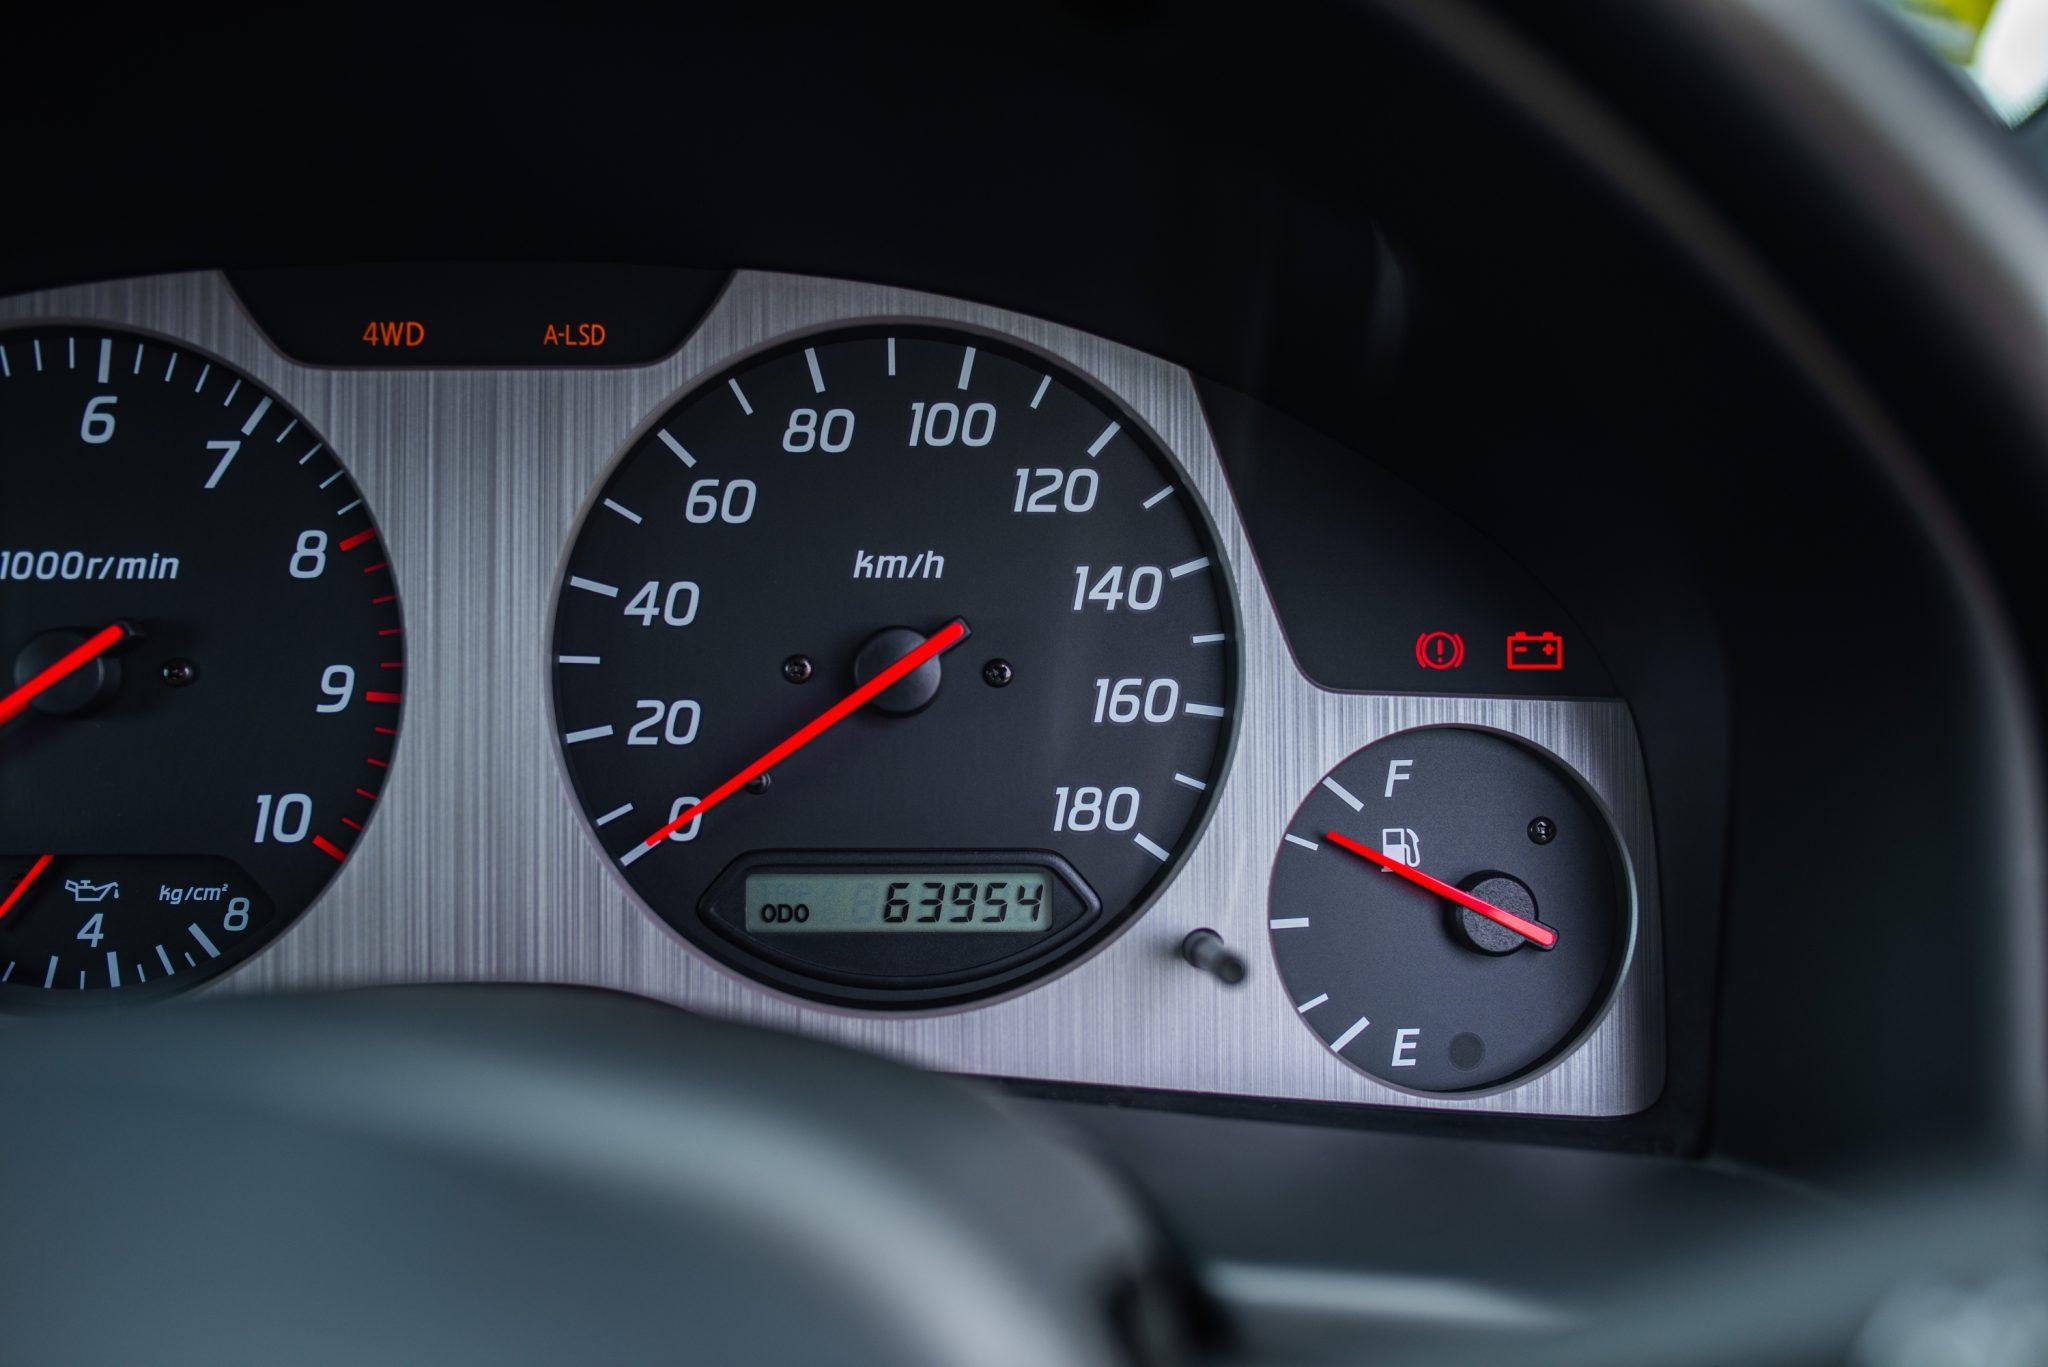 1999 Nissan Skyline GT-R V-Spec speedometer